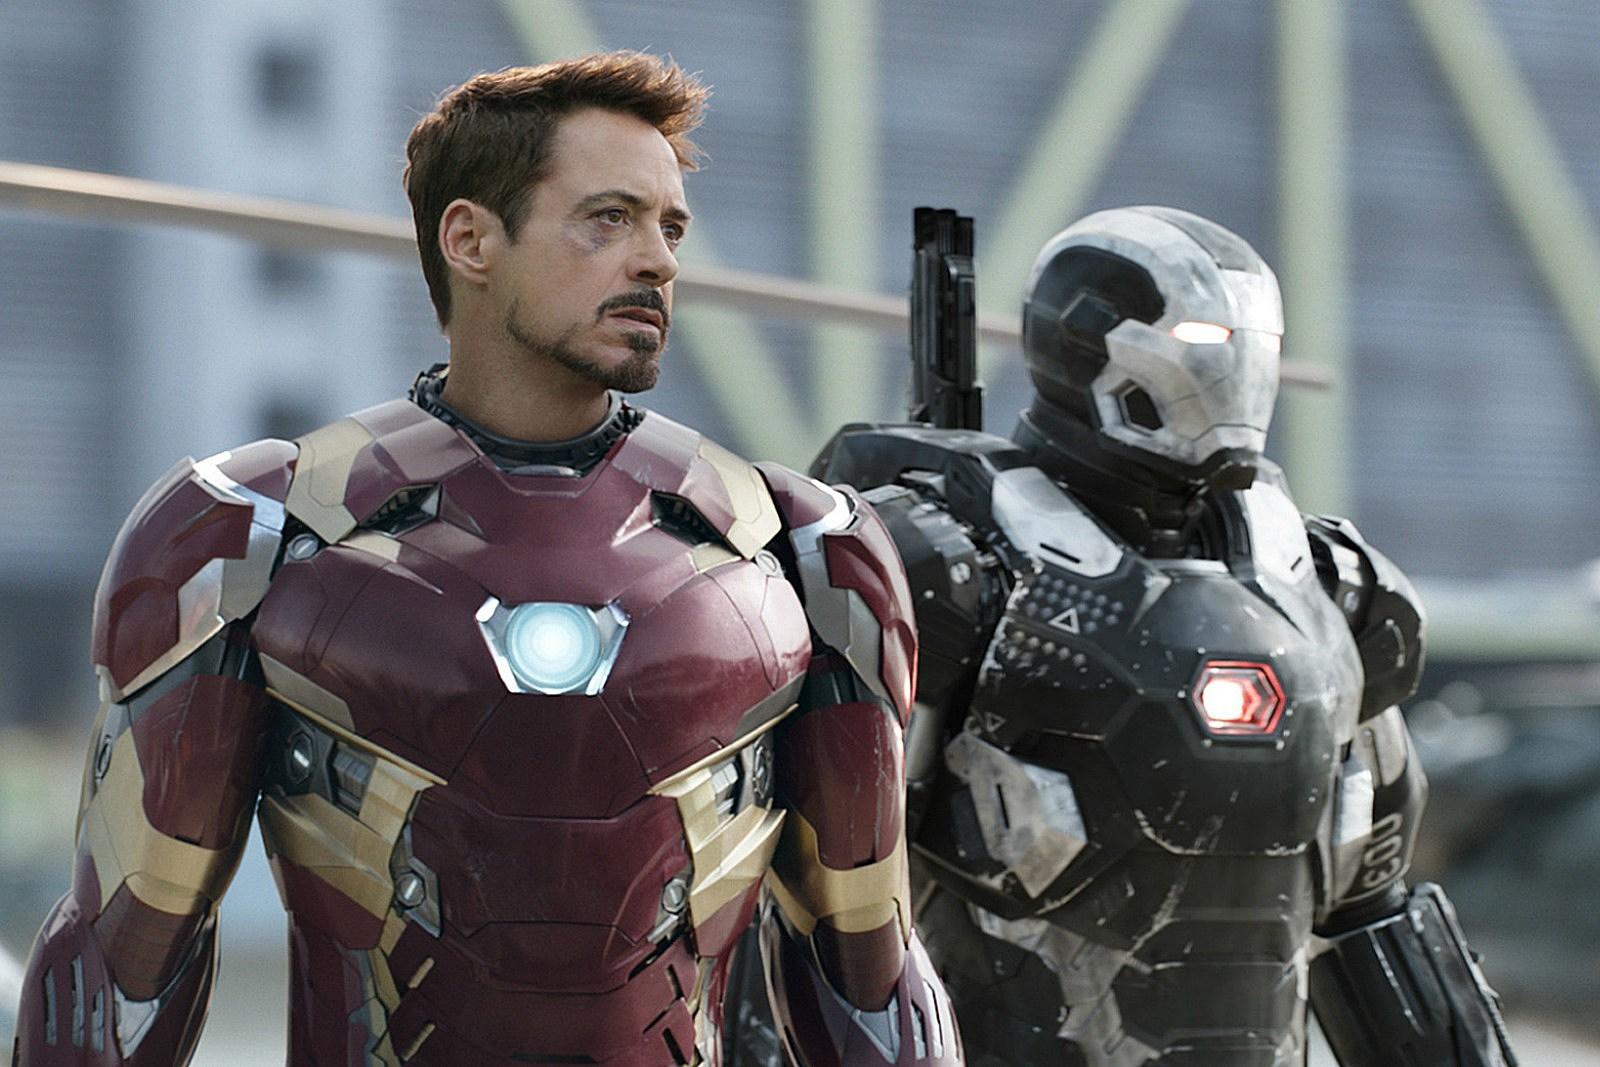 iron man and war machine ile ilgili görsel sonucu